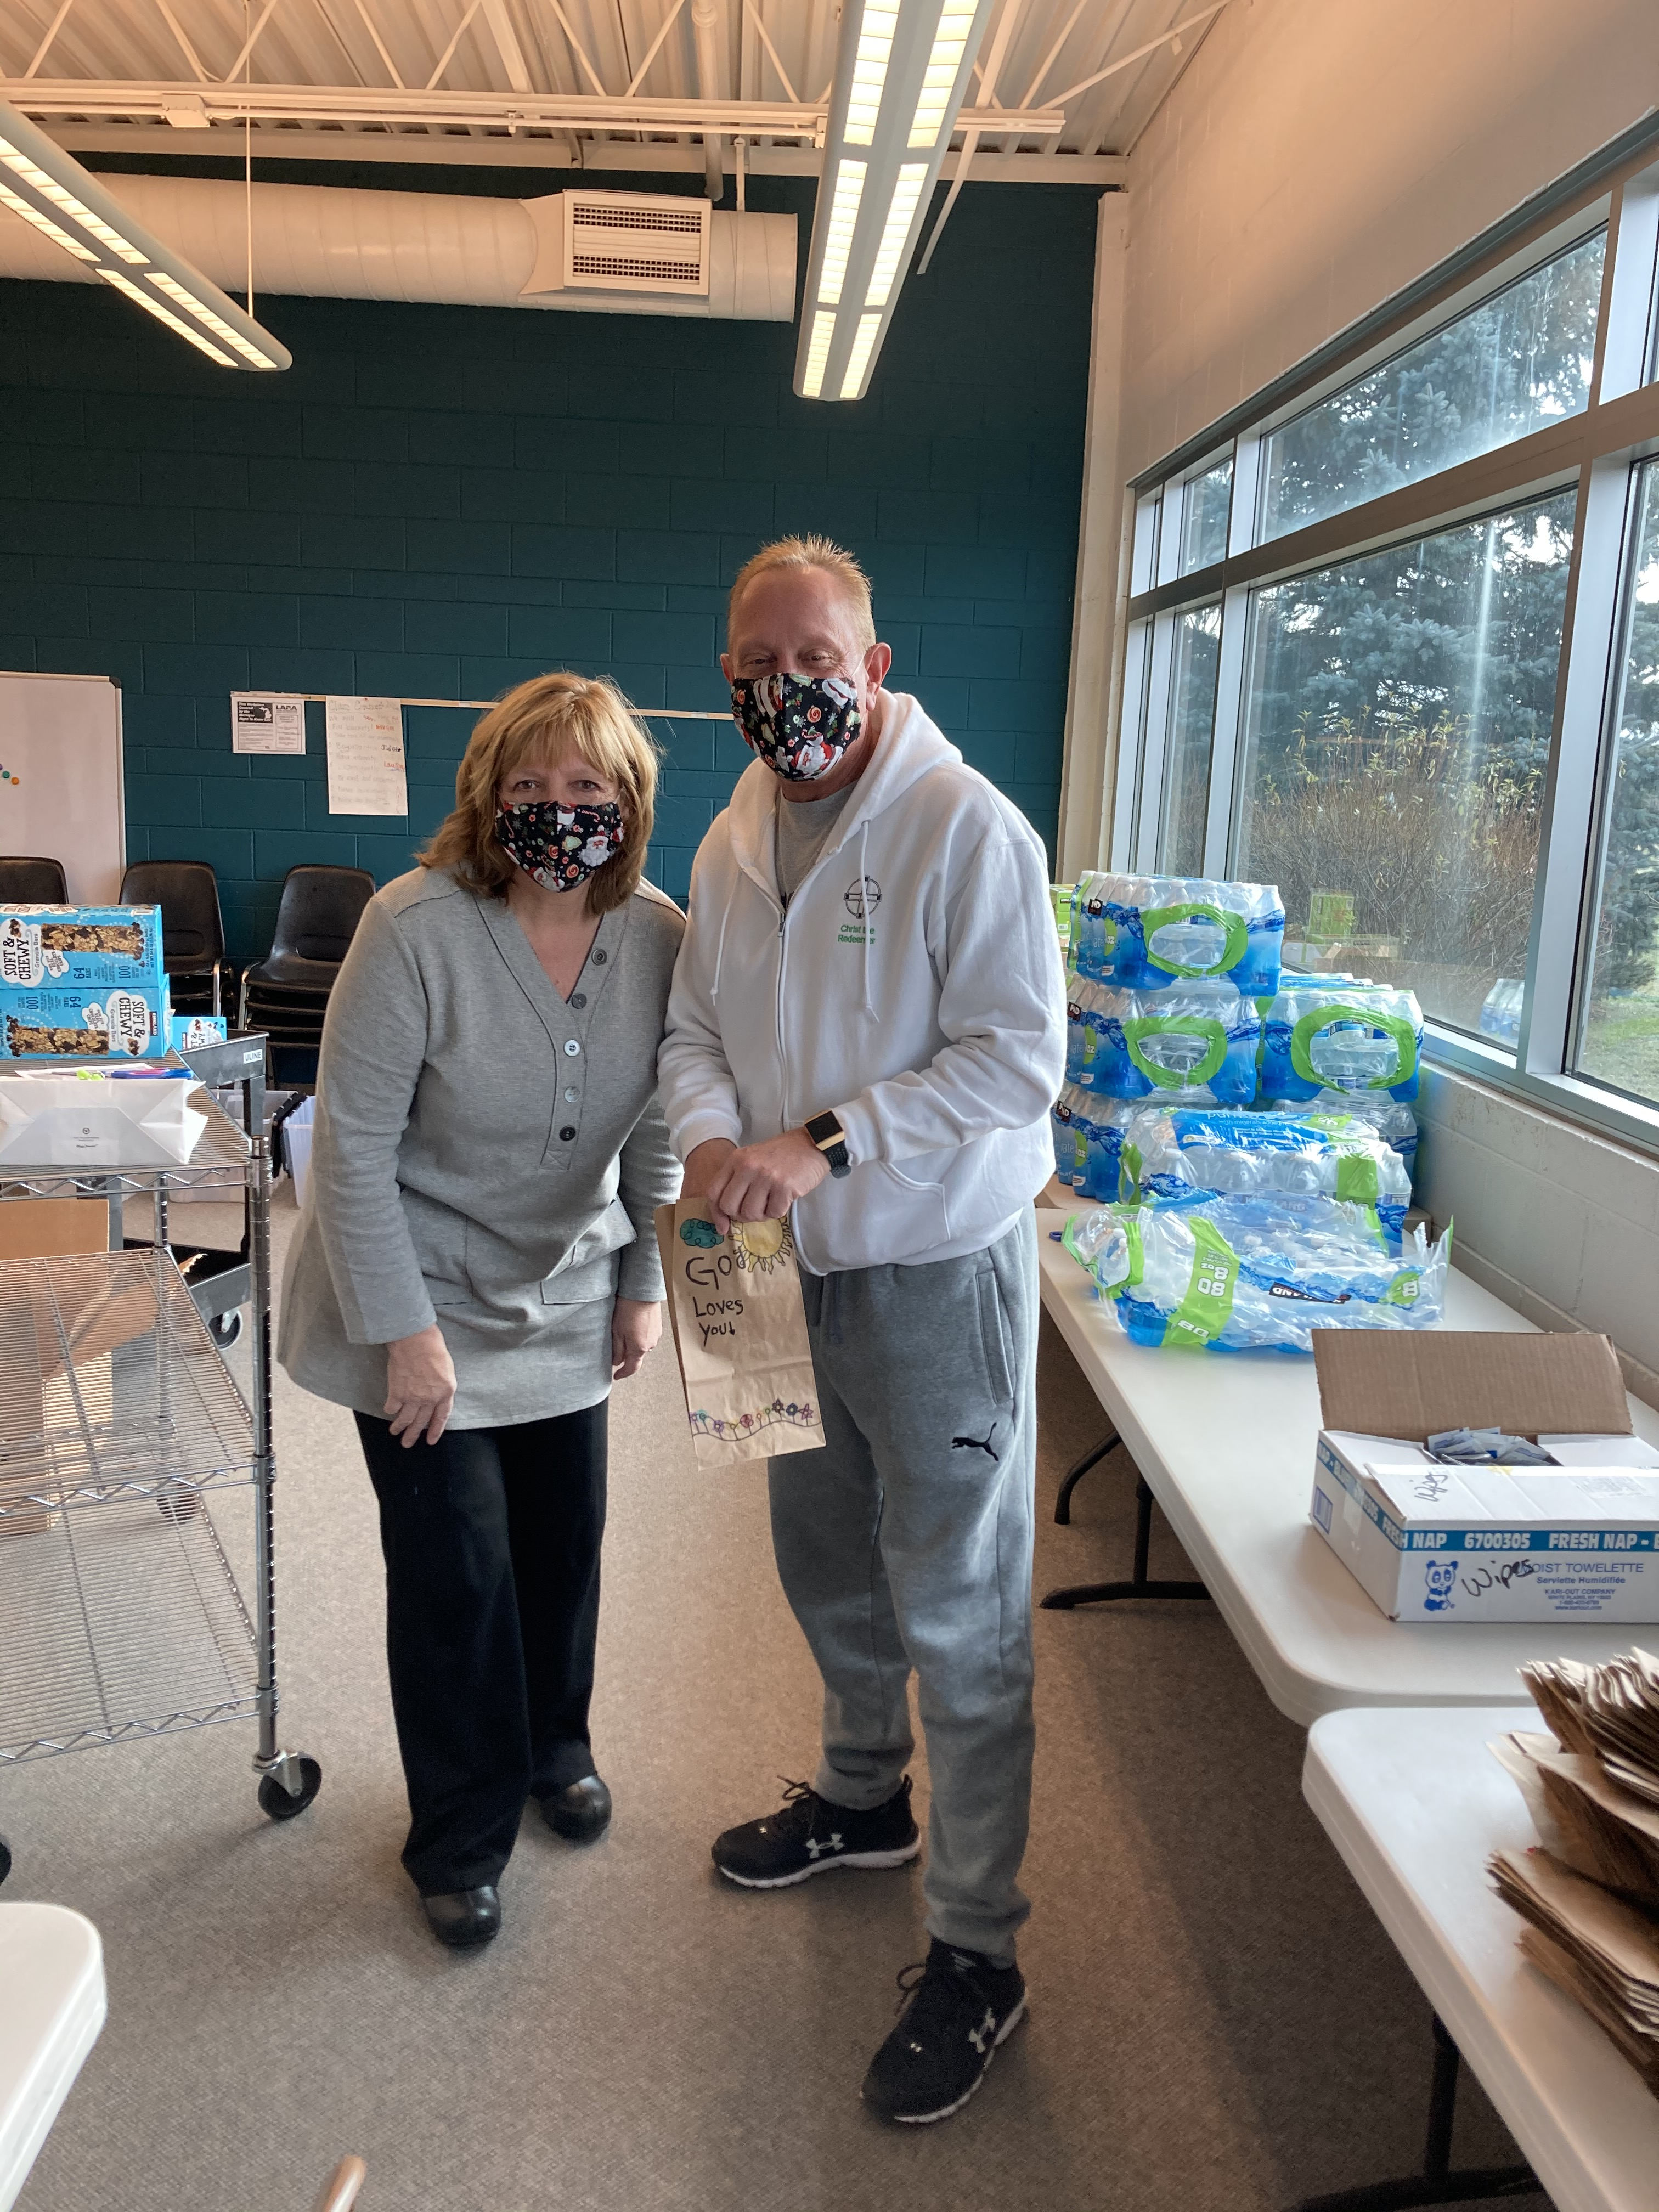 Lisa Pratt & Fr. Bill Promesso putting together snack packs.